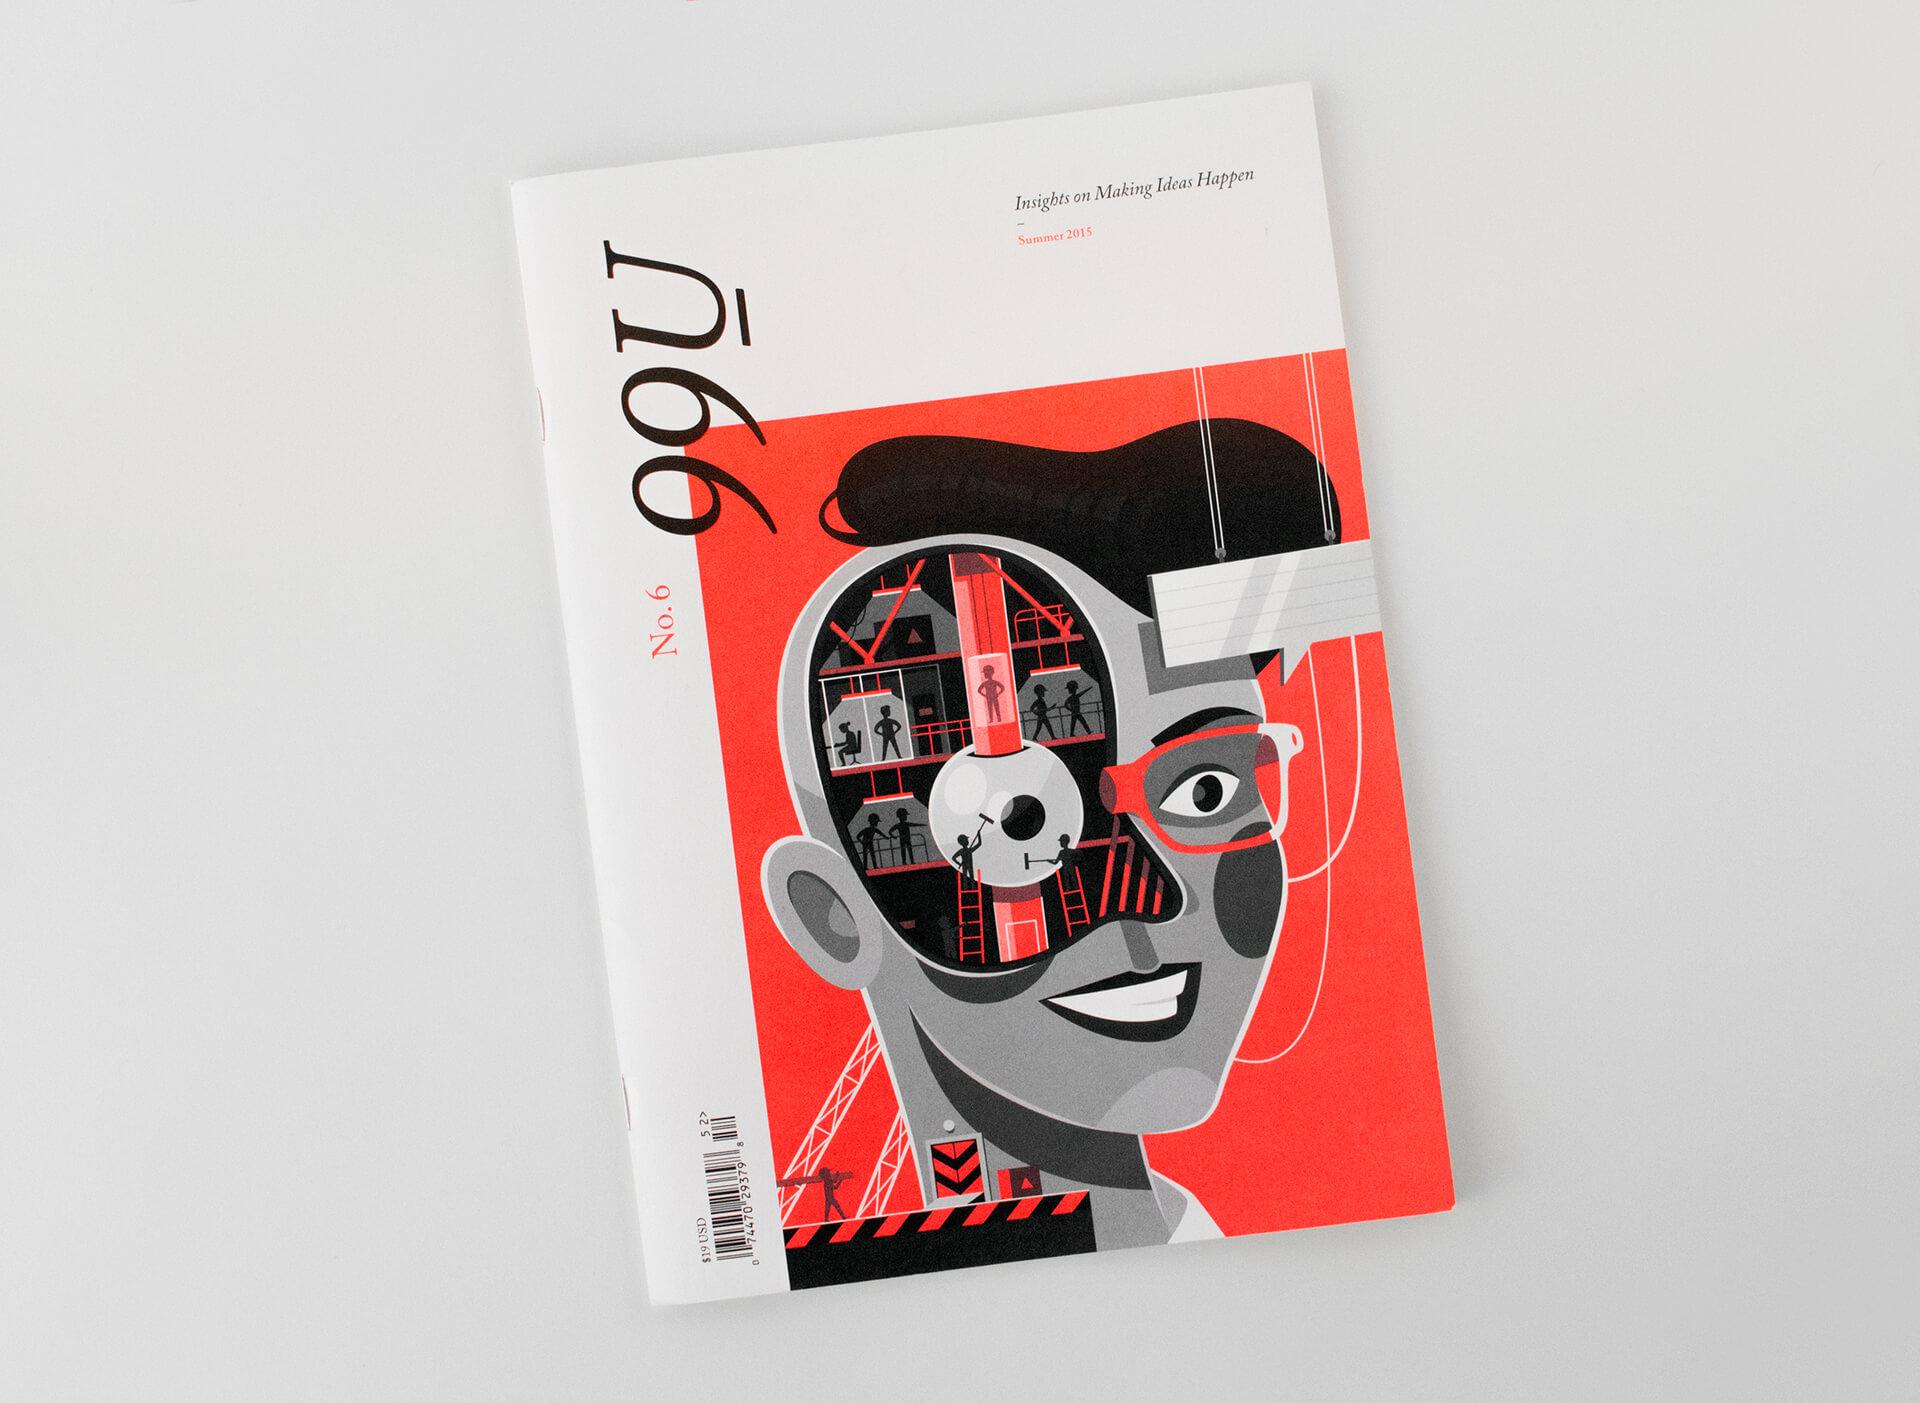 99U-Quarterly-Issue-6-01